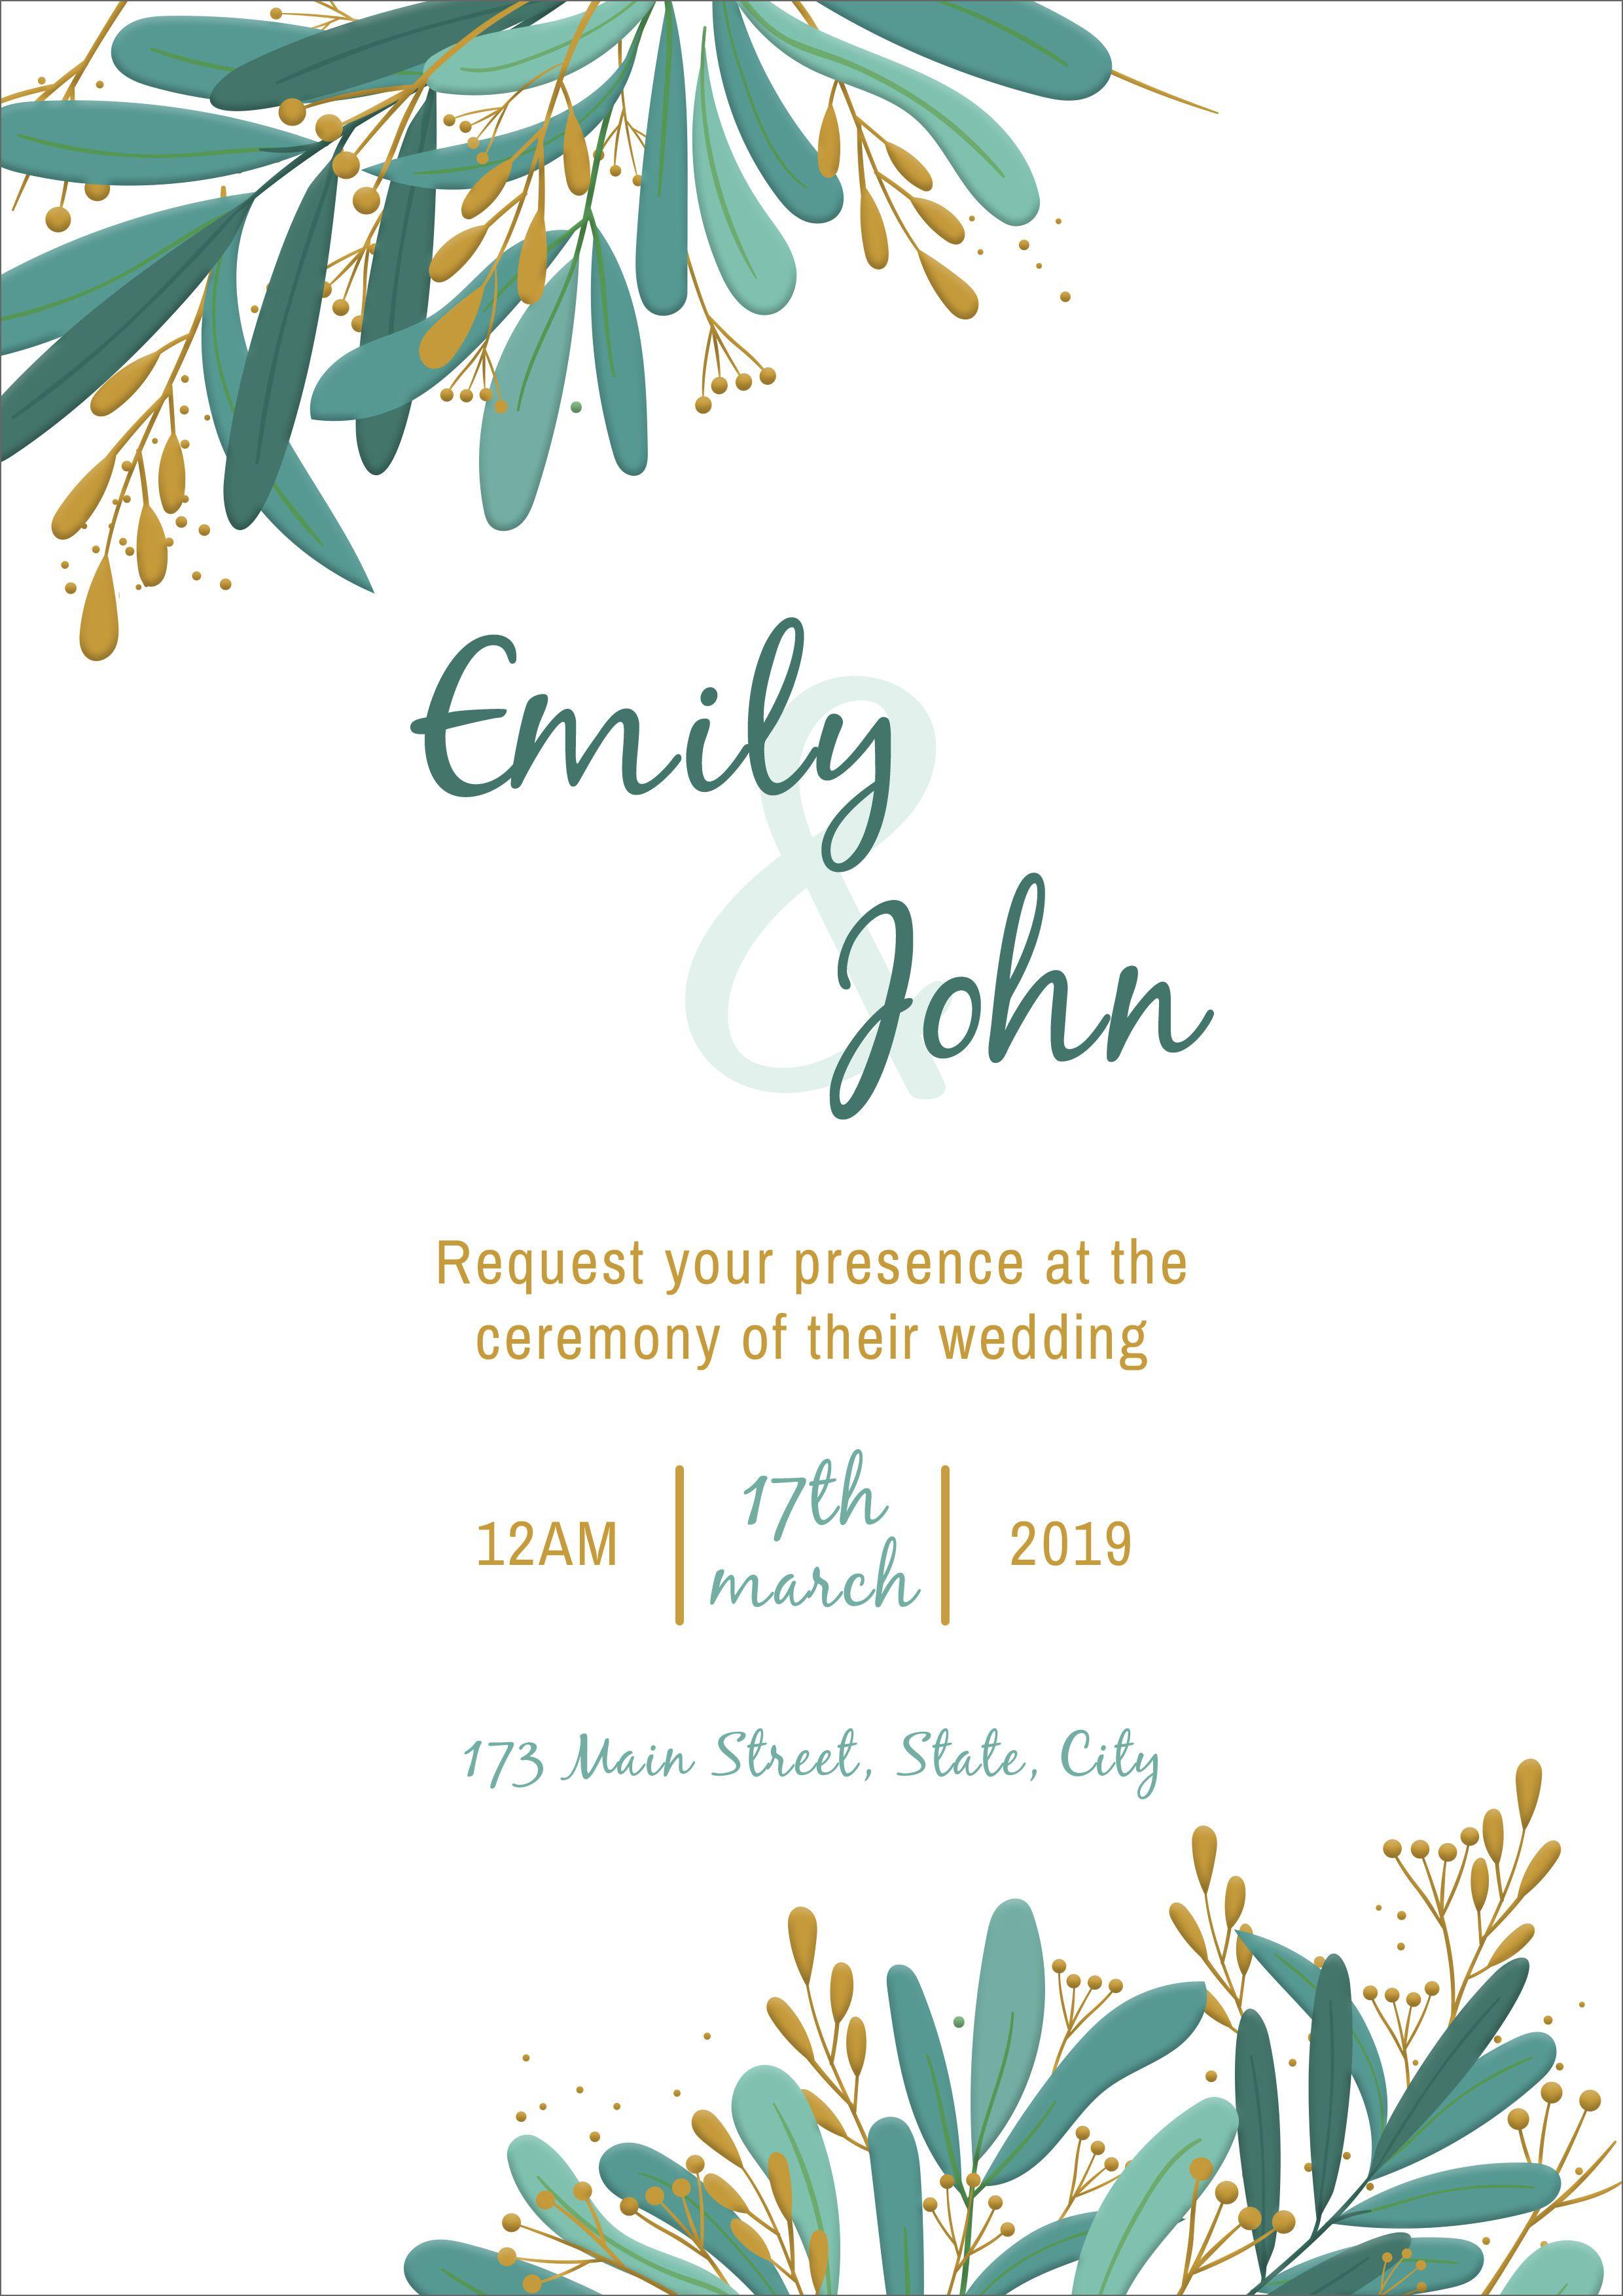 009 Exceptional Sample Wedding Invitation Card Template Concept  Templates Free Design Response WordingFull